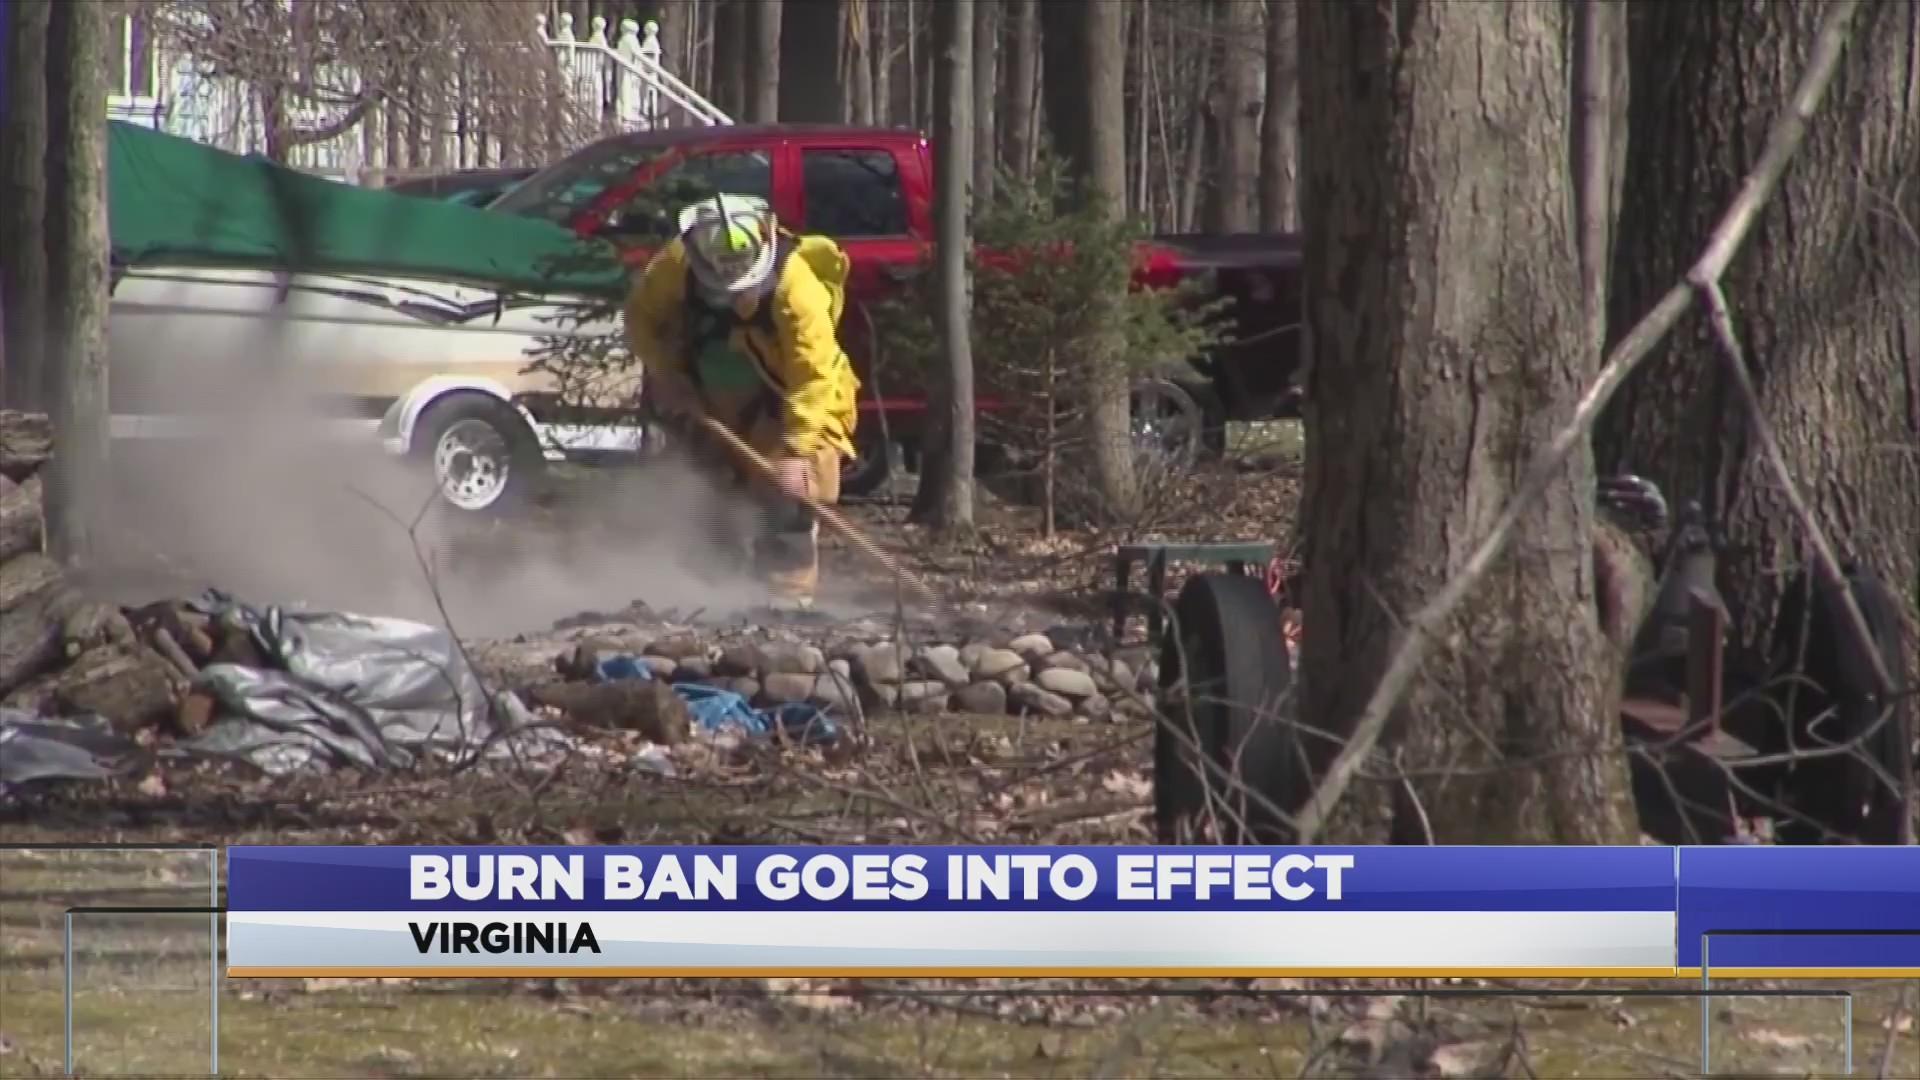 VIRGINIA BURN BAN